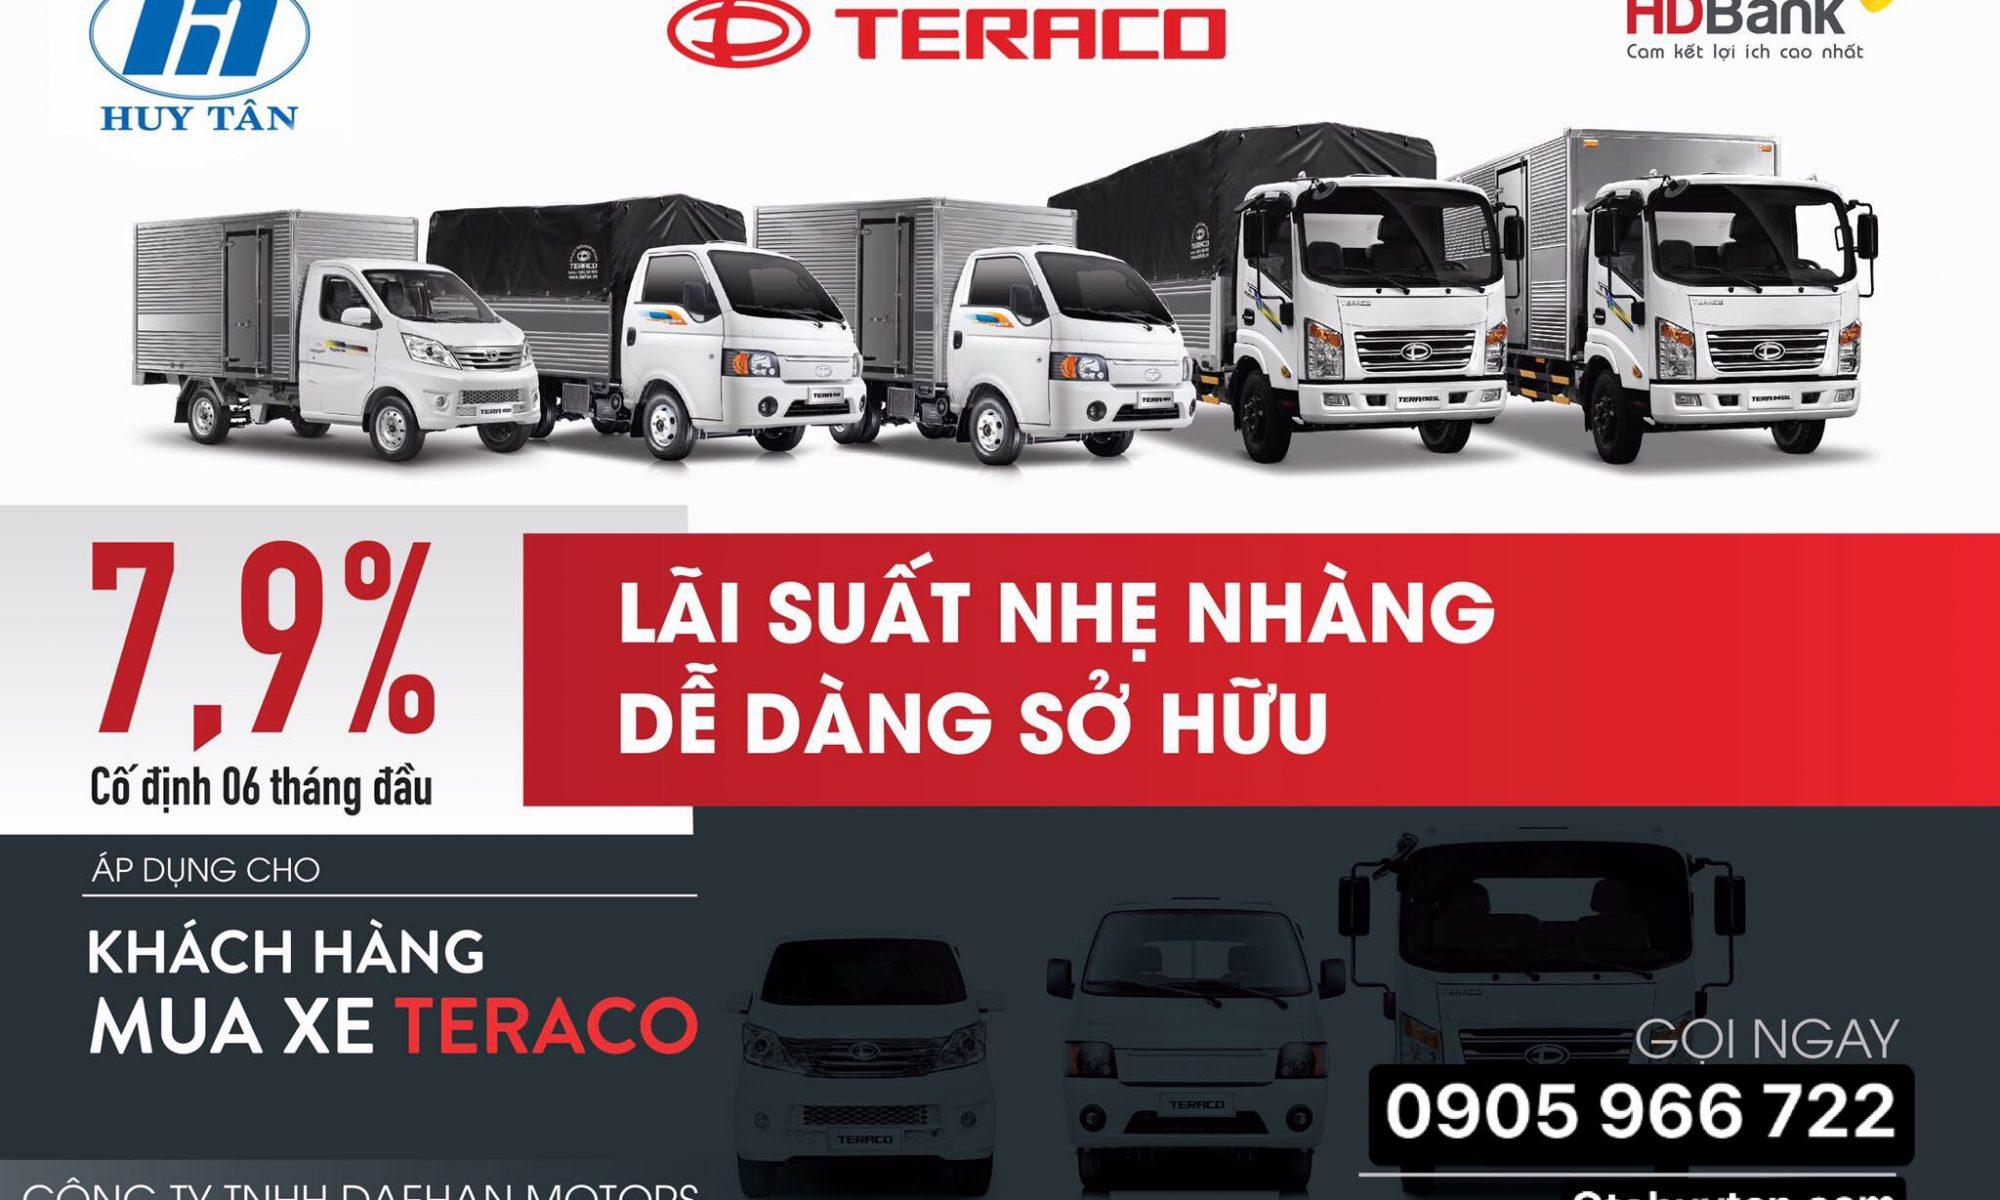 Teraco Nha Trang